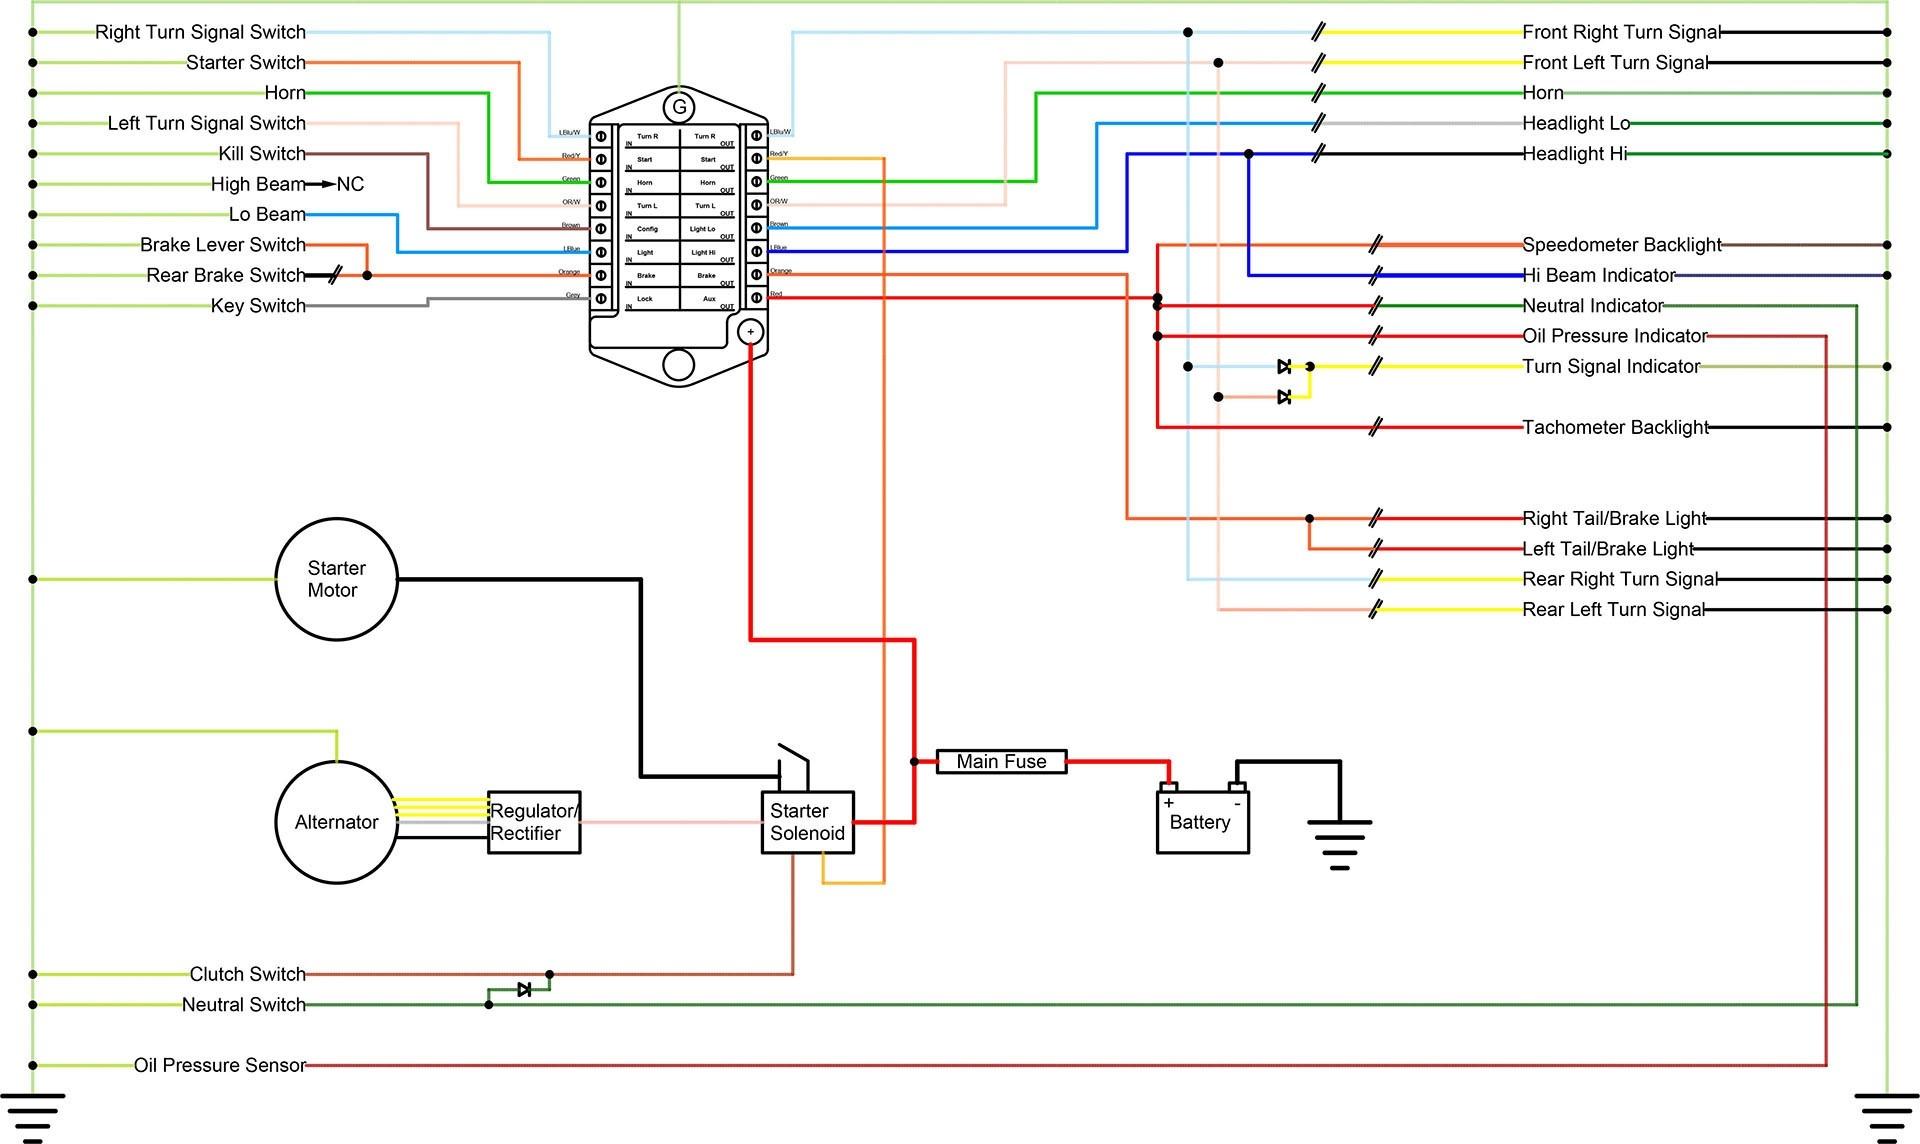 lithonia led wiring diagram   wiring diagram on emergency exit cobra  controls wire diagram, emergency